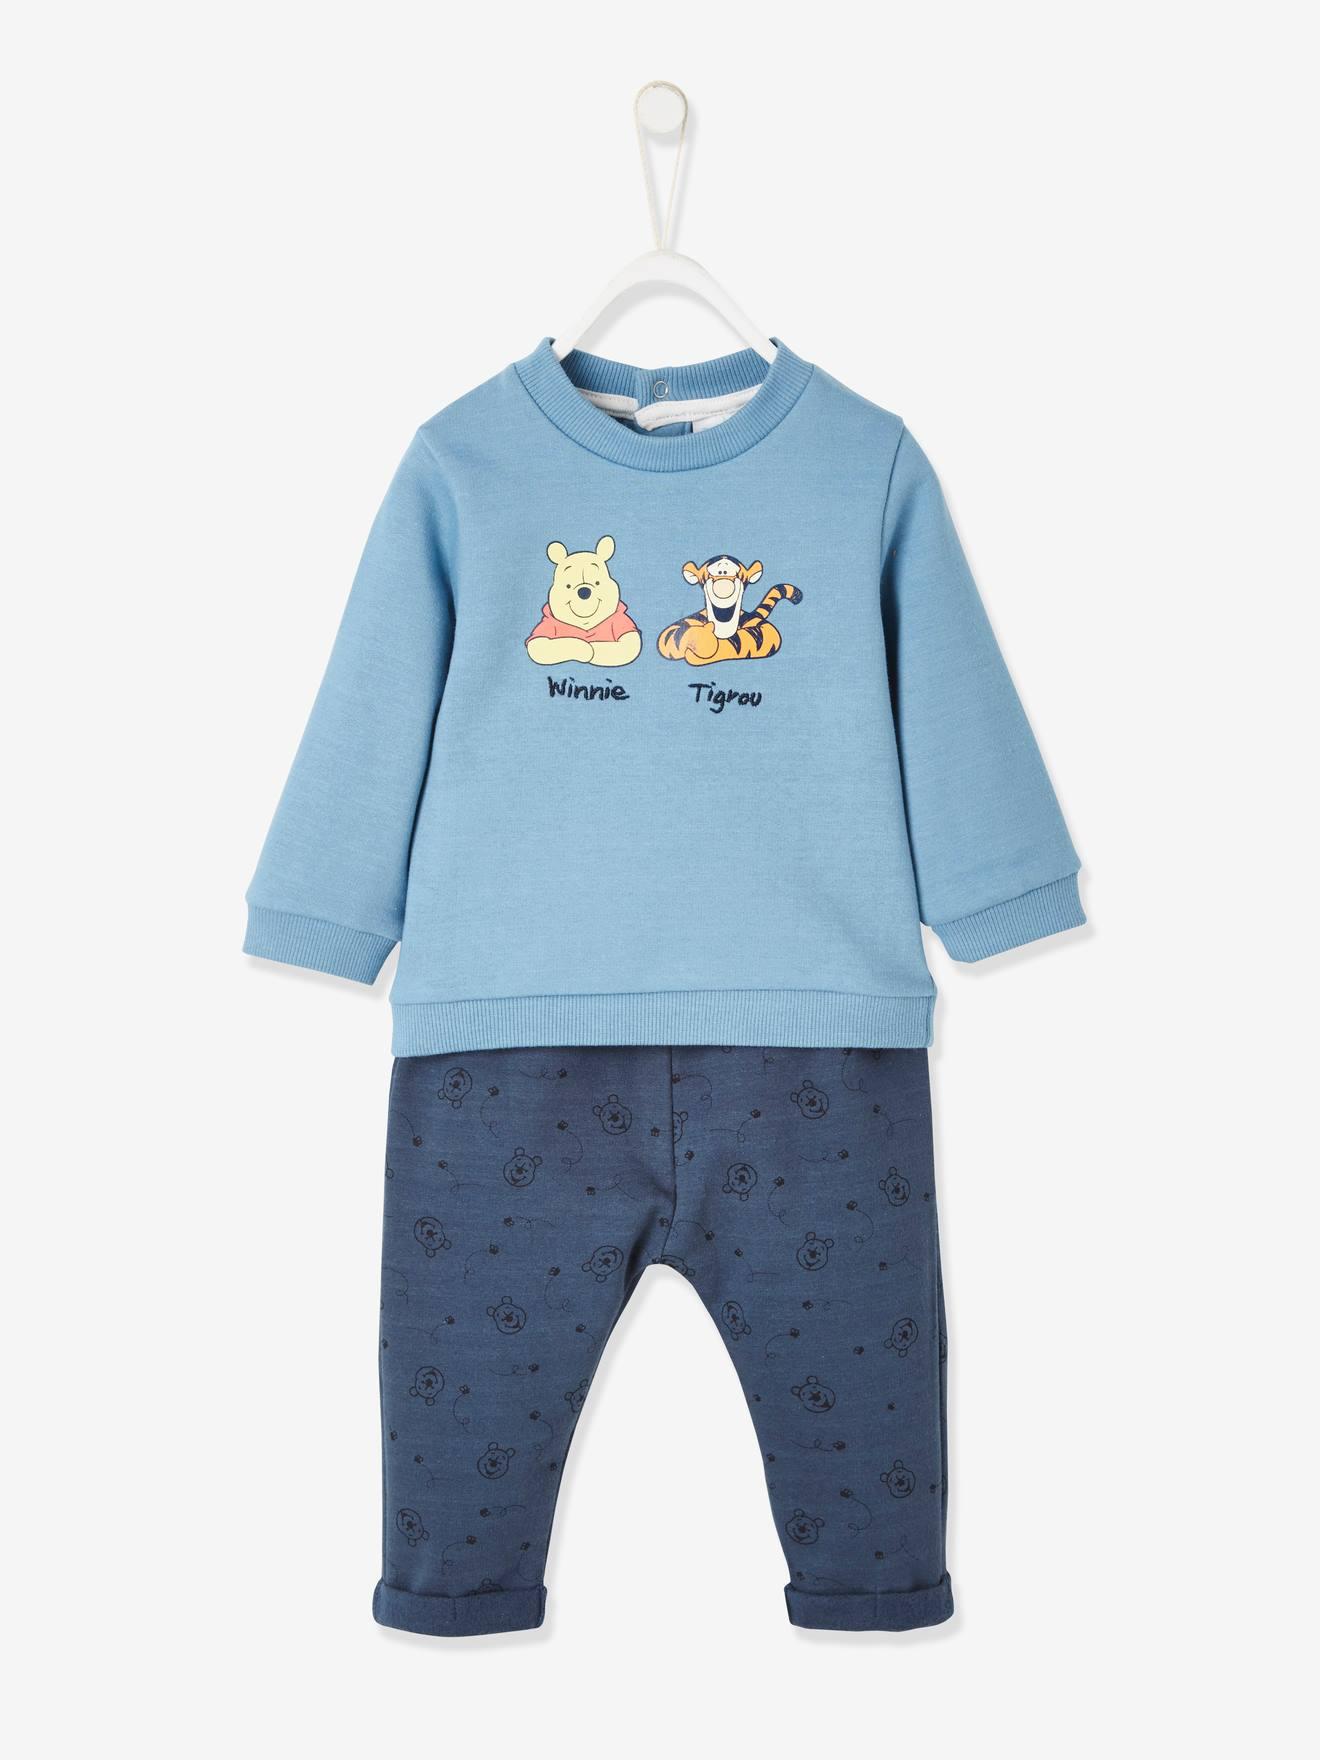 Ensemble bébé garçon Disney Winnie L'ourson® sweat et pantalon sarouel bleu jean